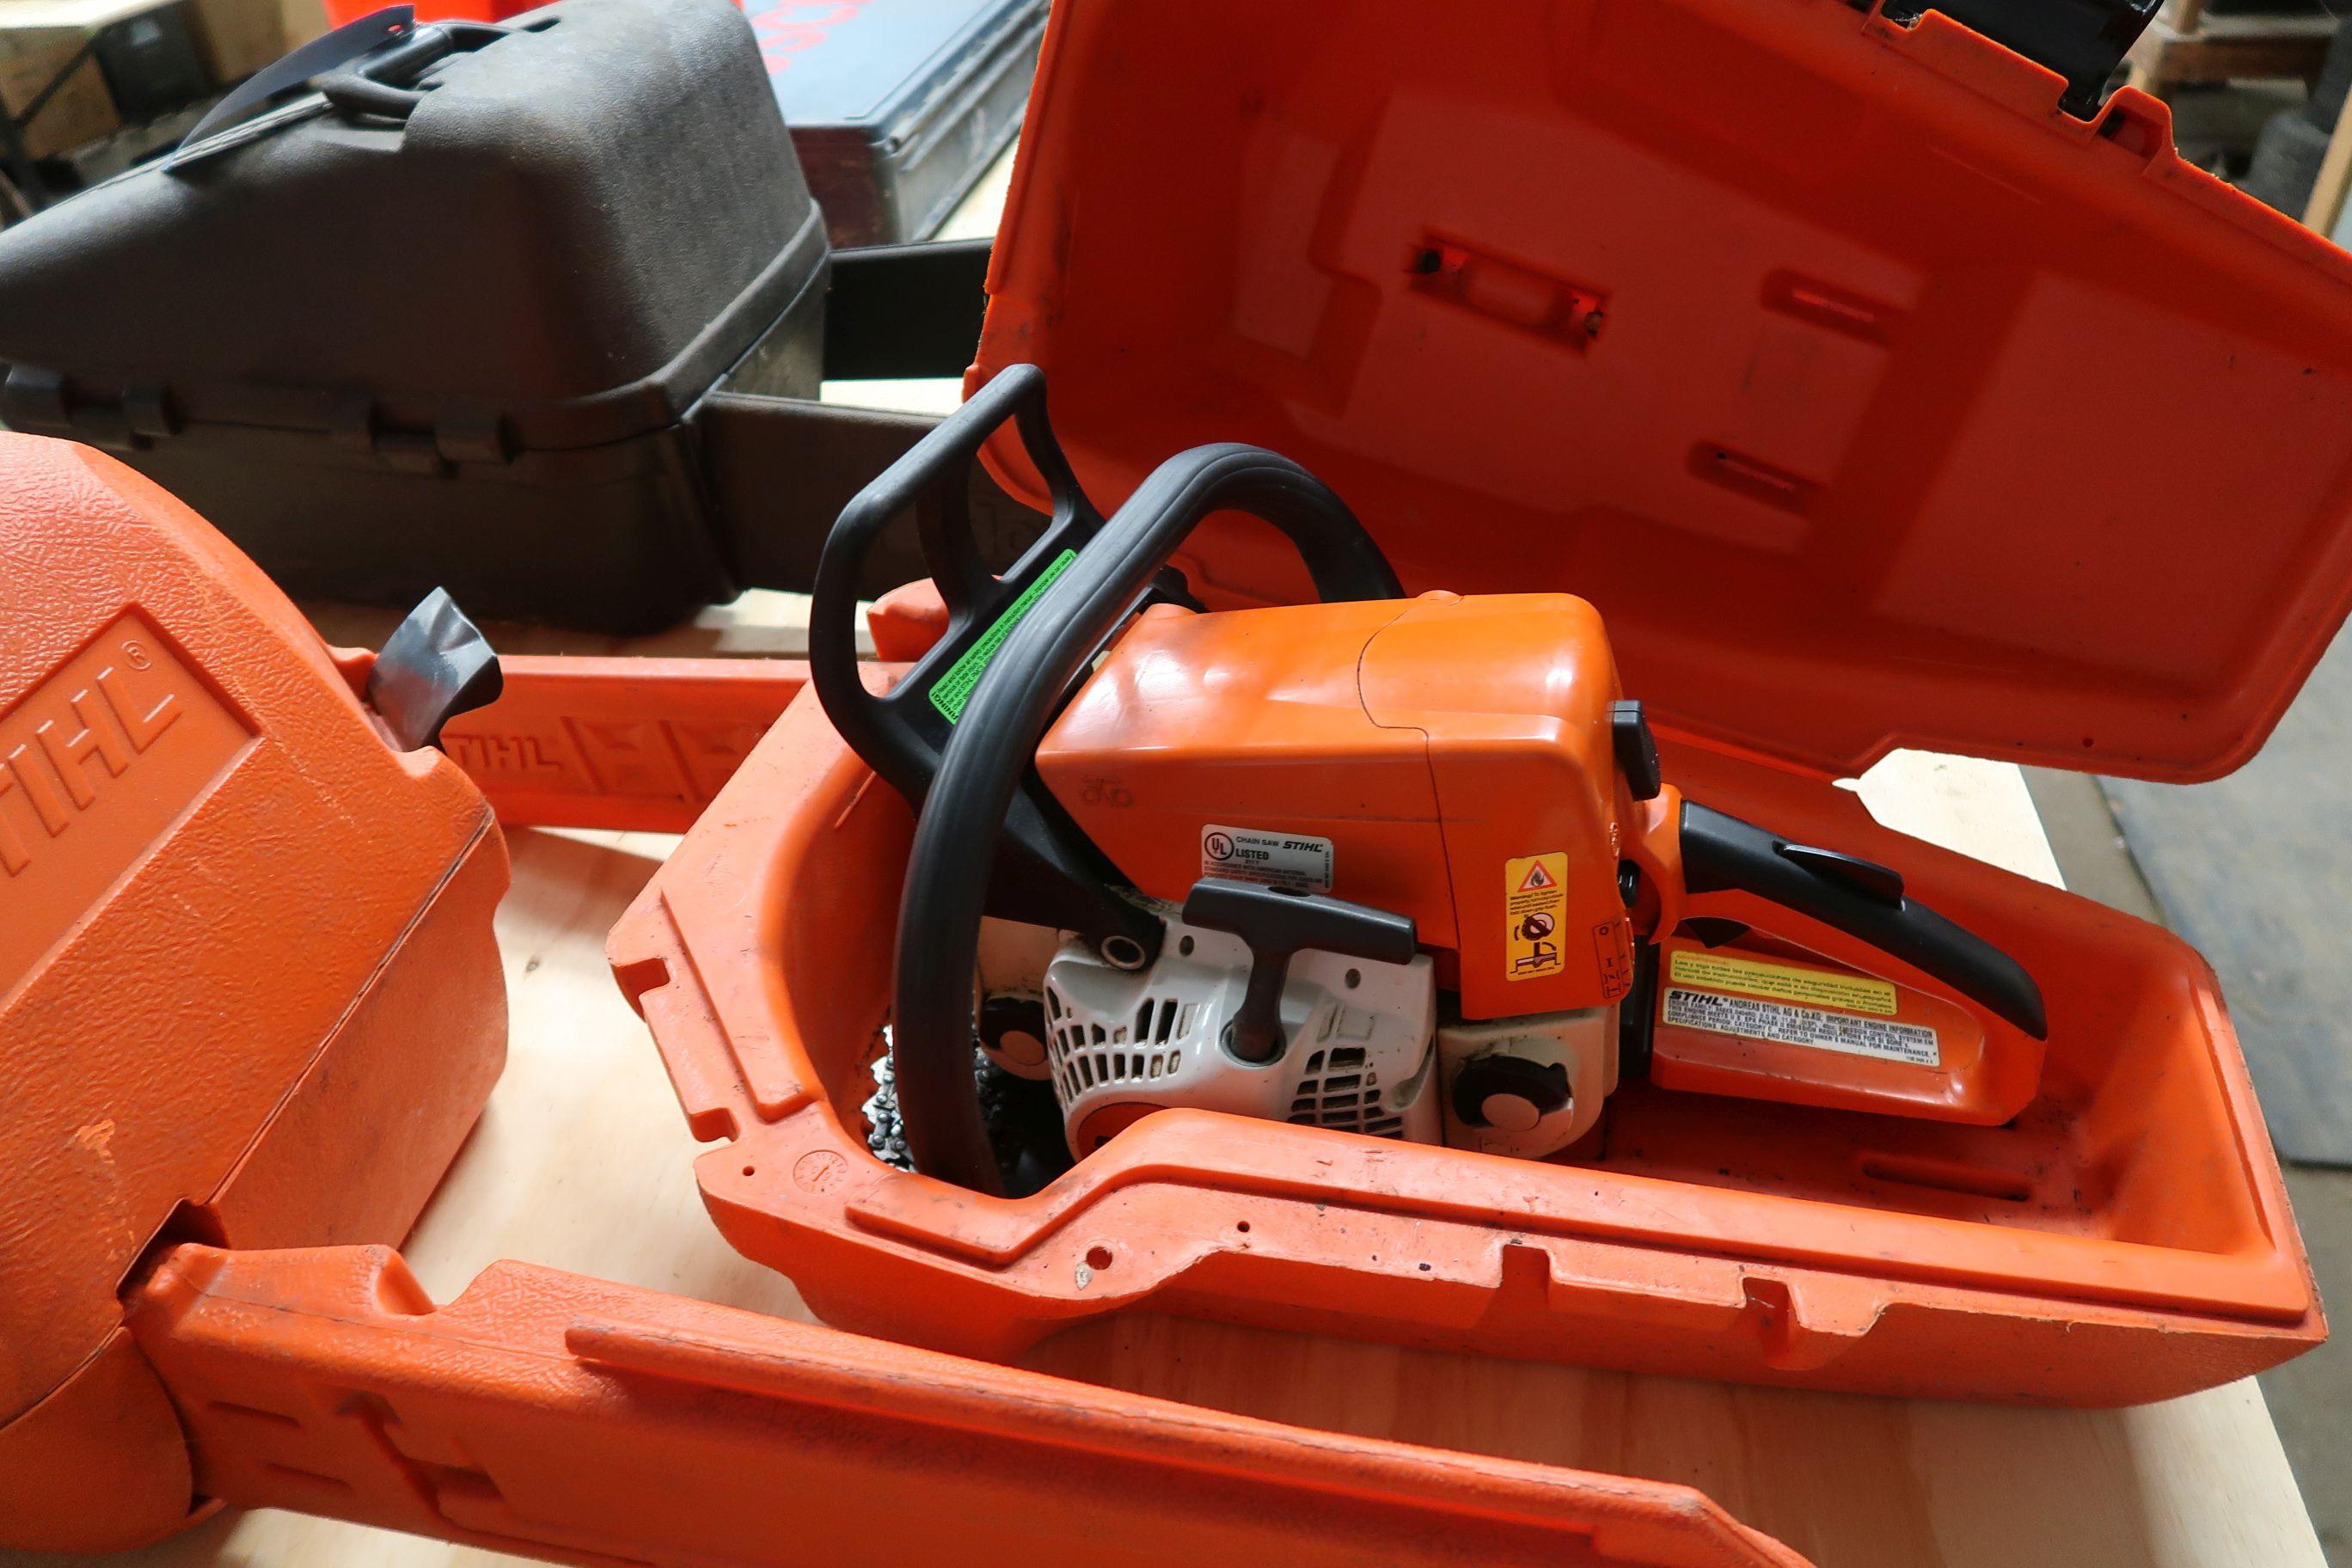 STIHL MS230C GAS POWERED CHAIN SAW